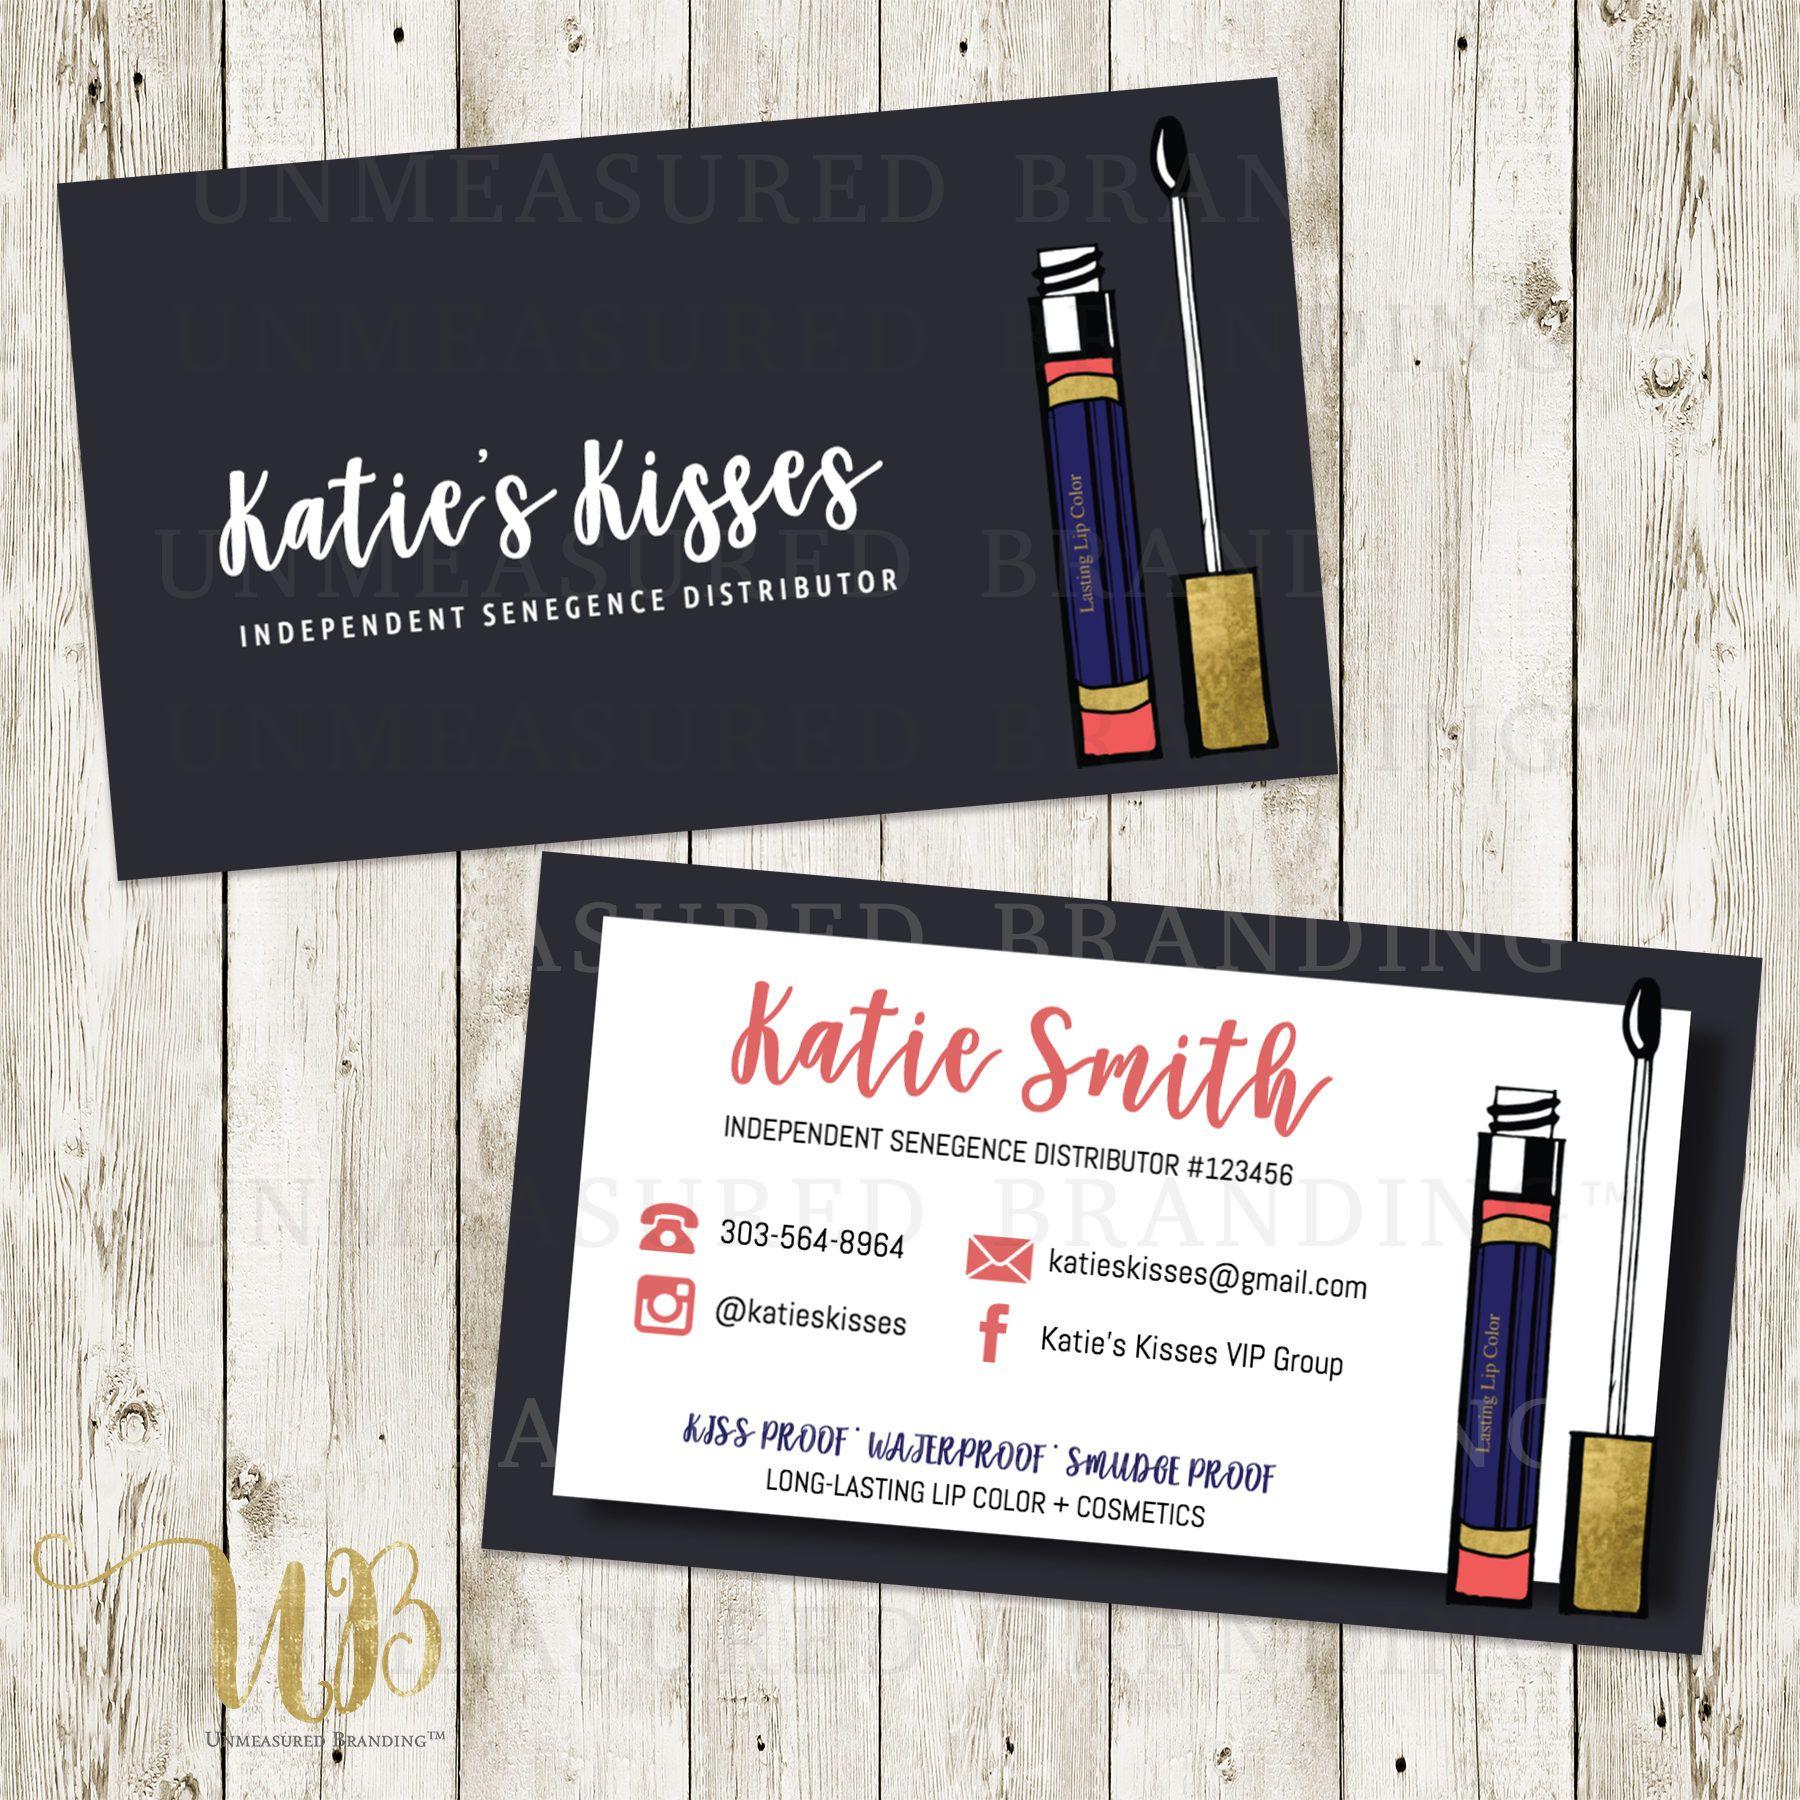 Lipsense Business Cards Senegence Business Cards Gold Business